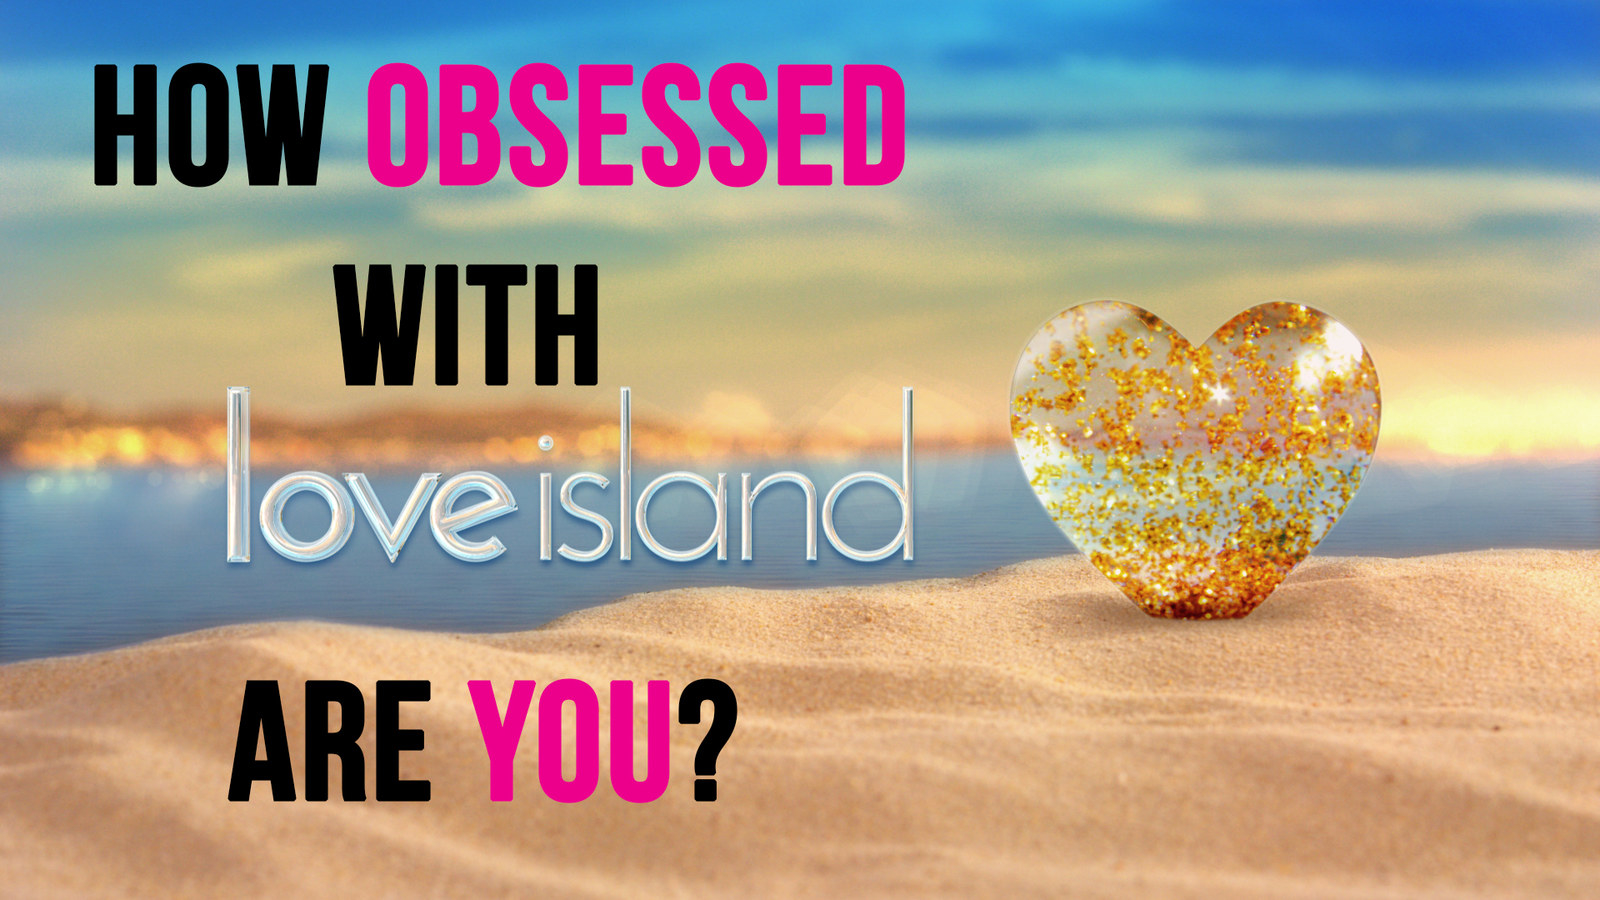 Love Island Facebook